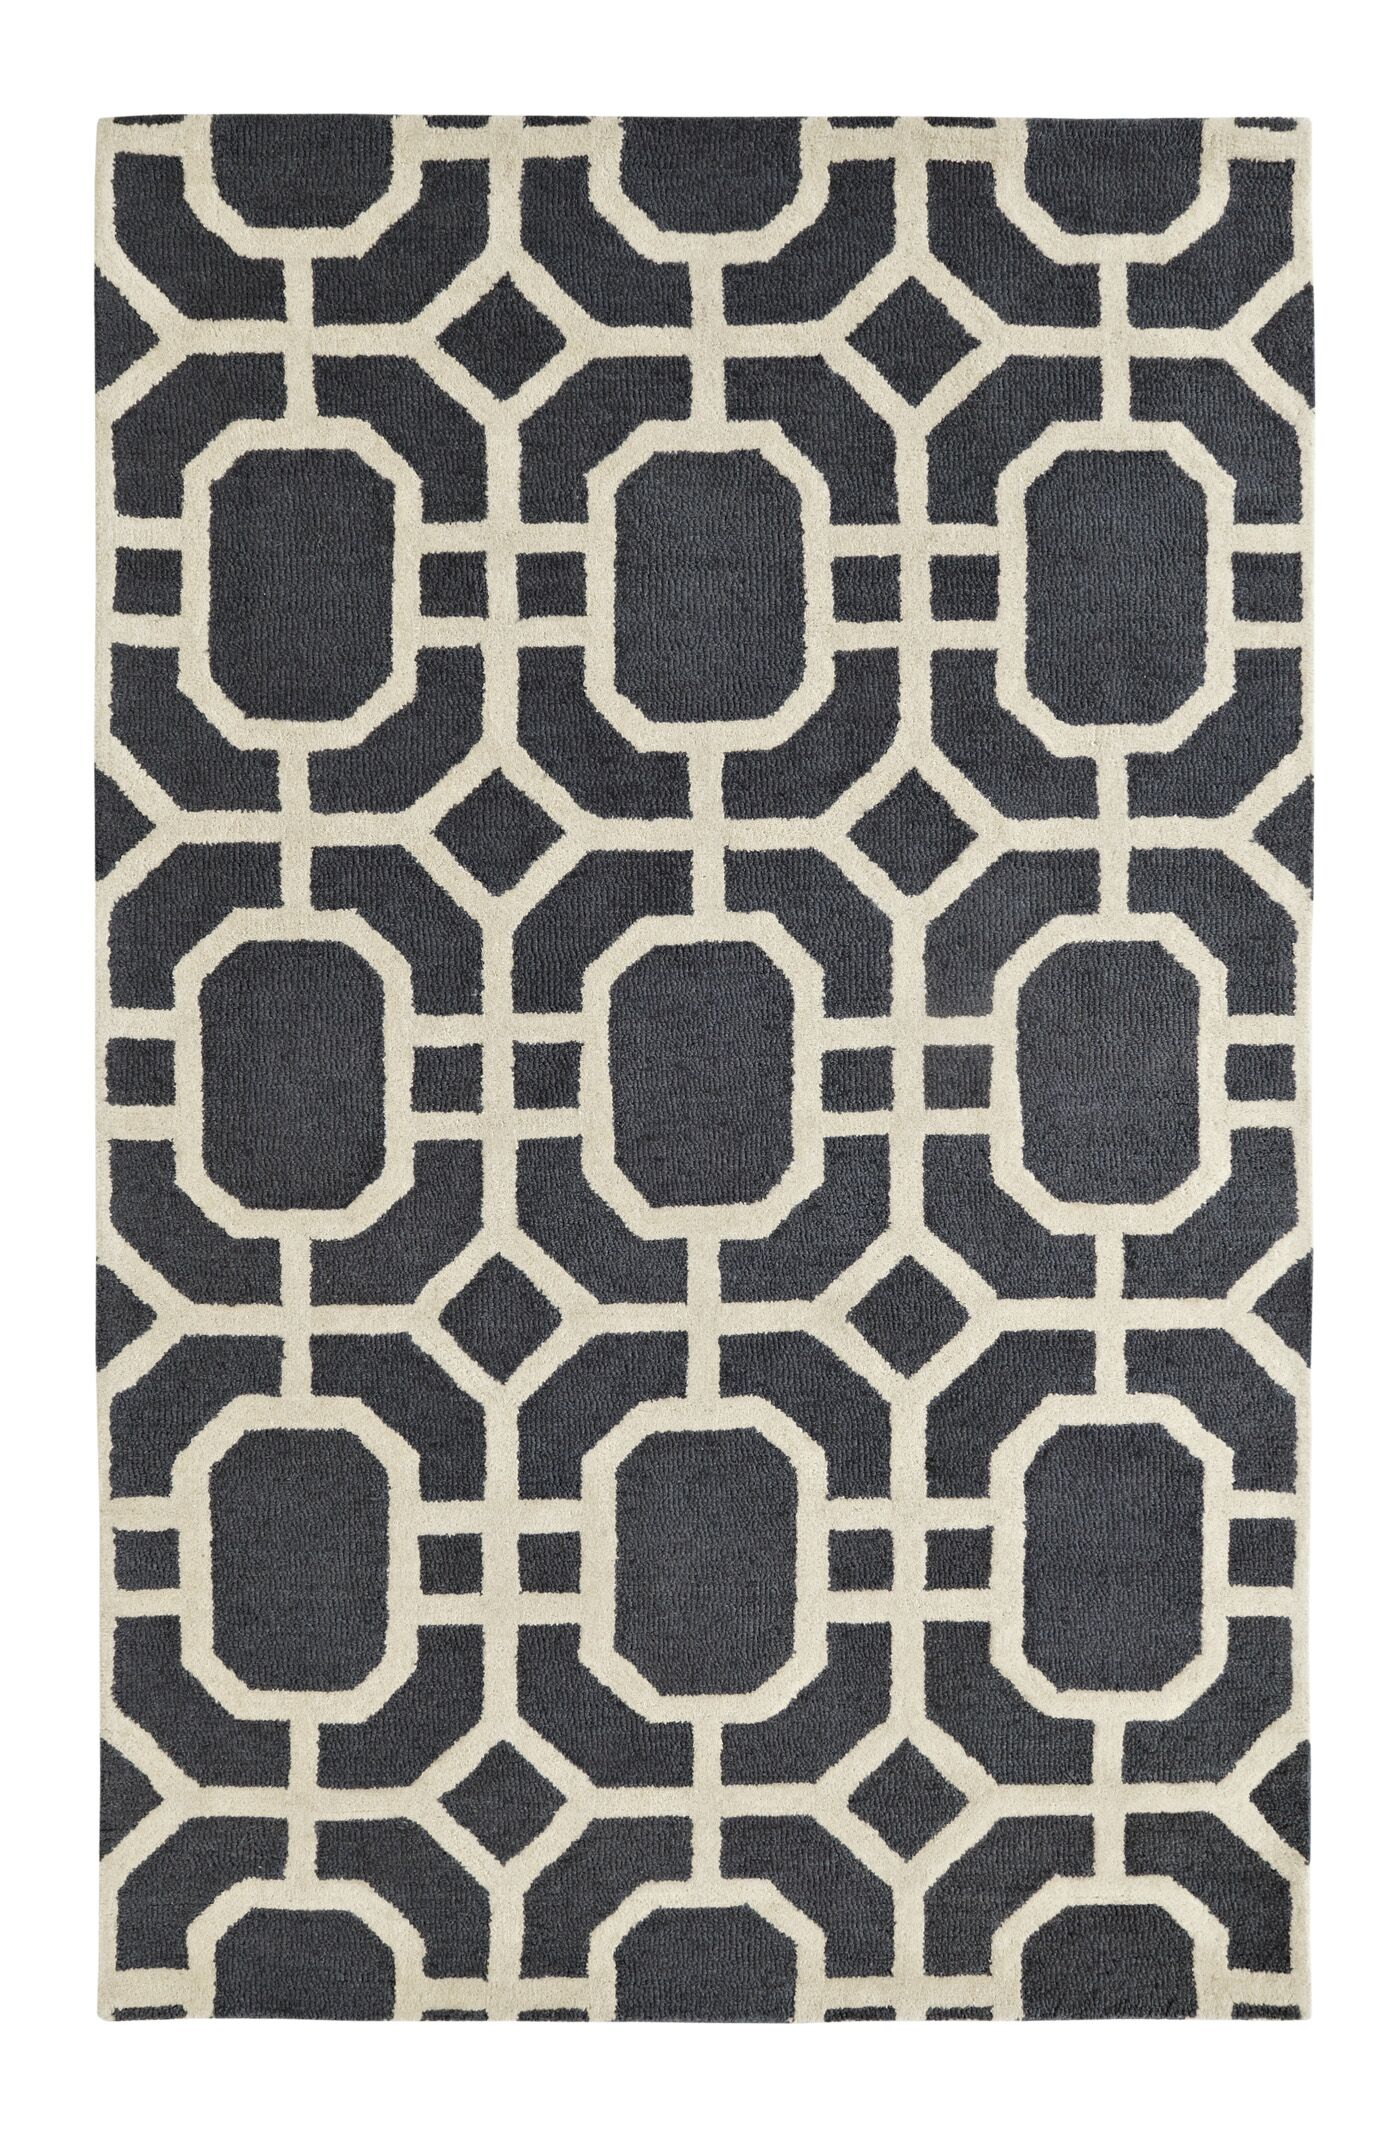 Rentz Ivory/Grey Area Rug Rug Size: Rectangle 4' x 6'